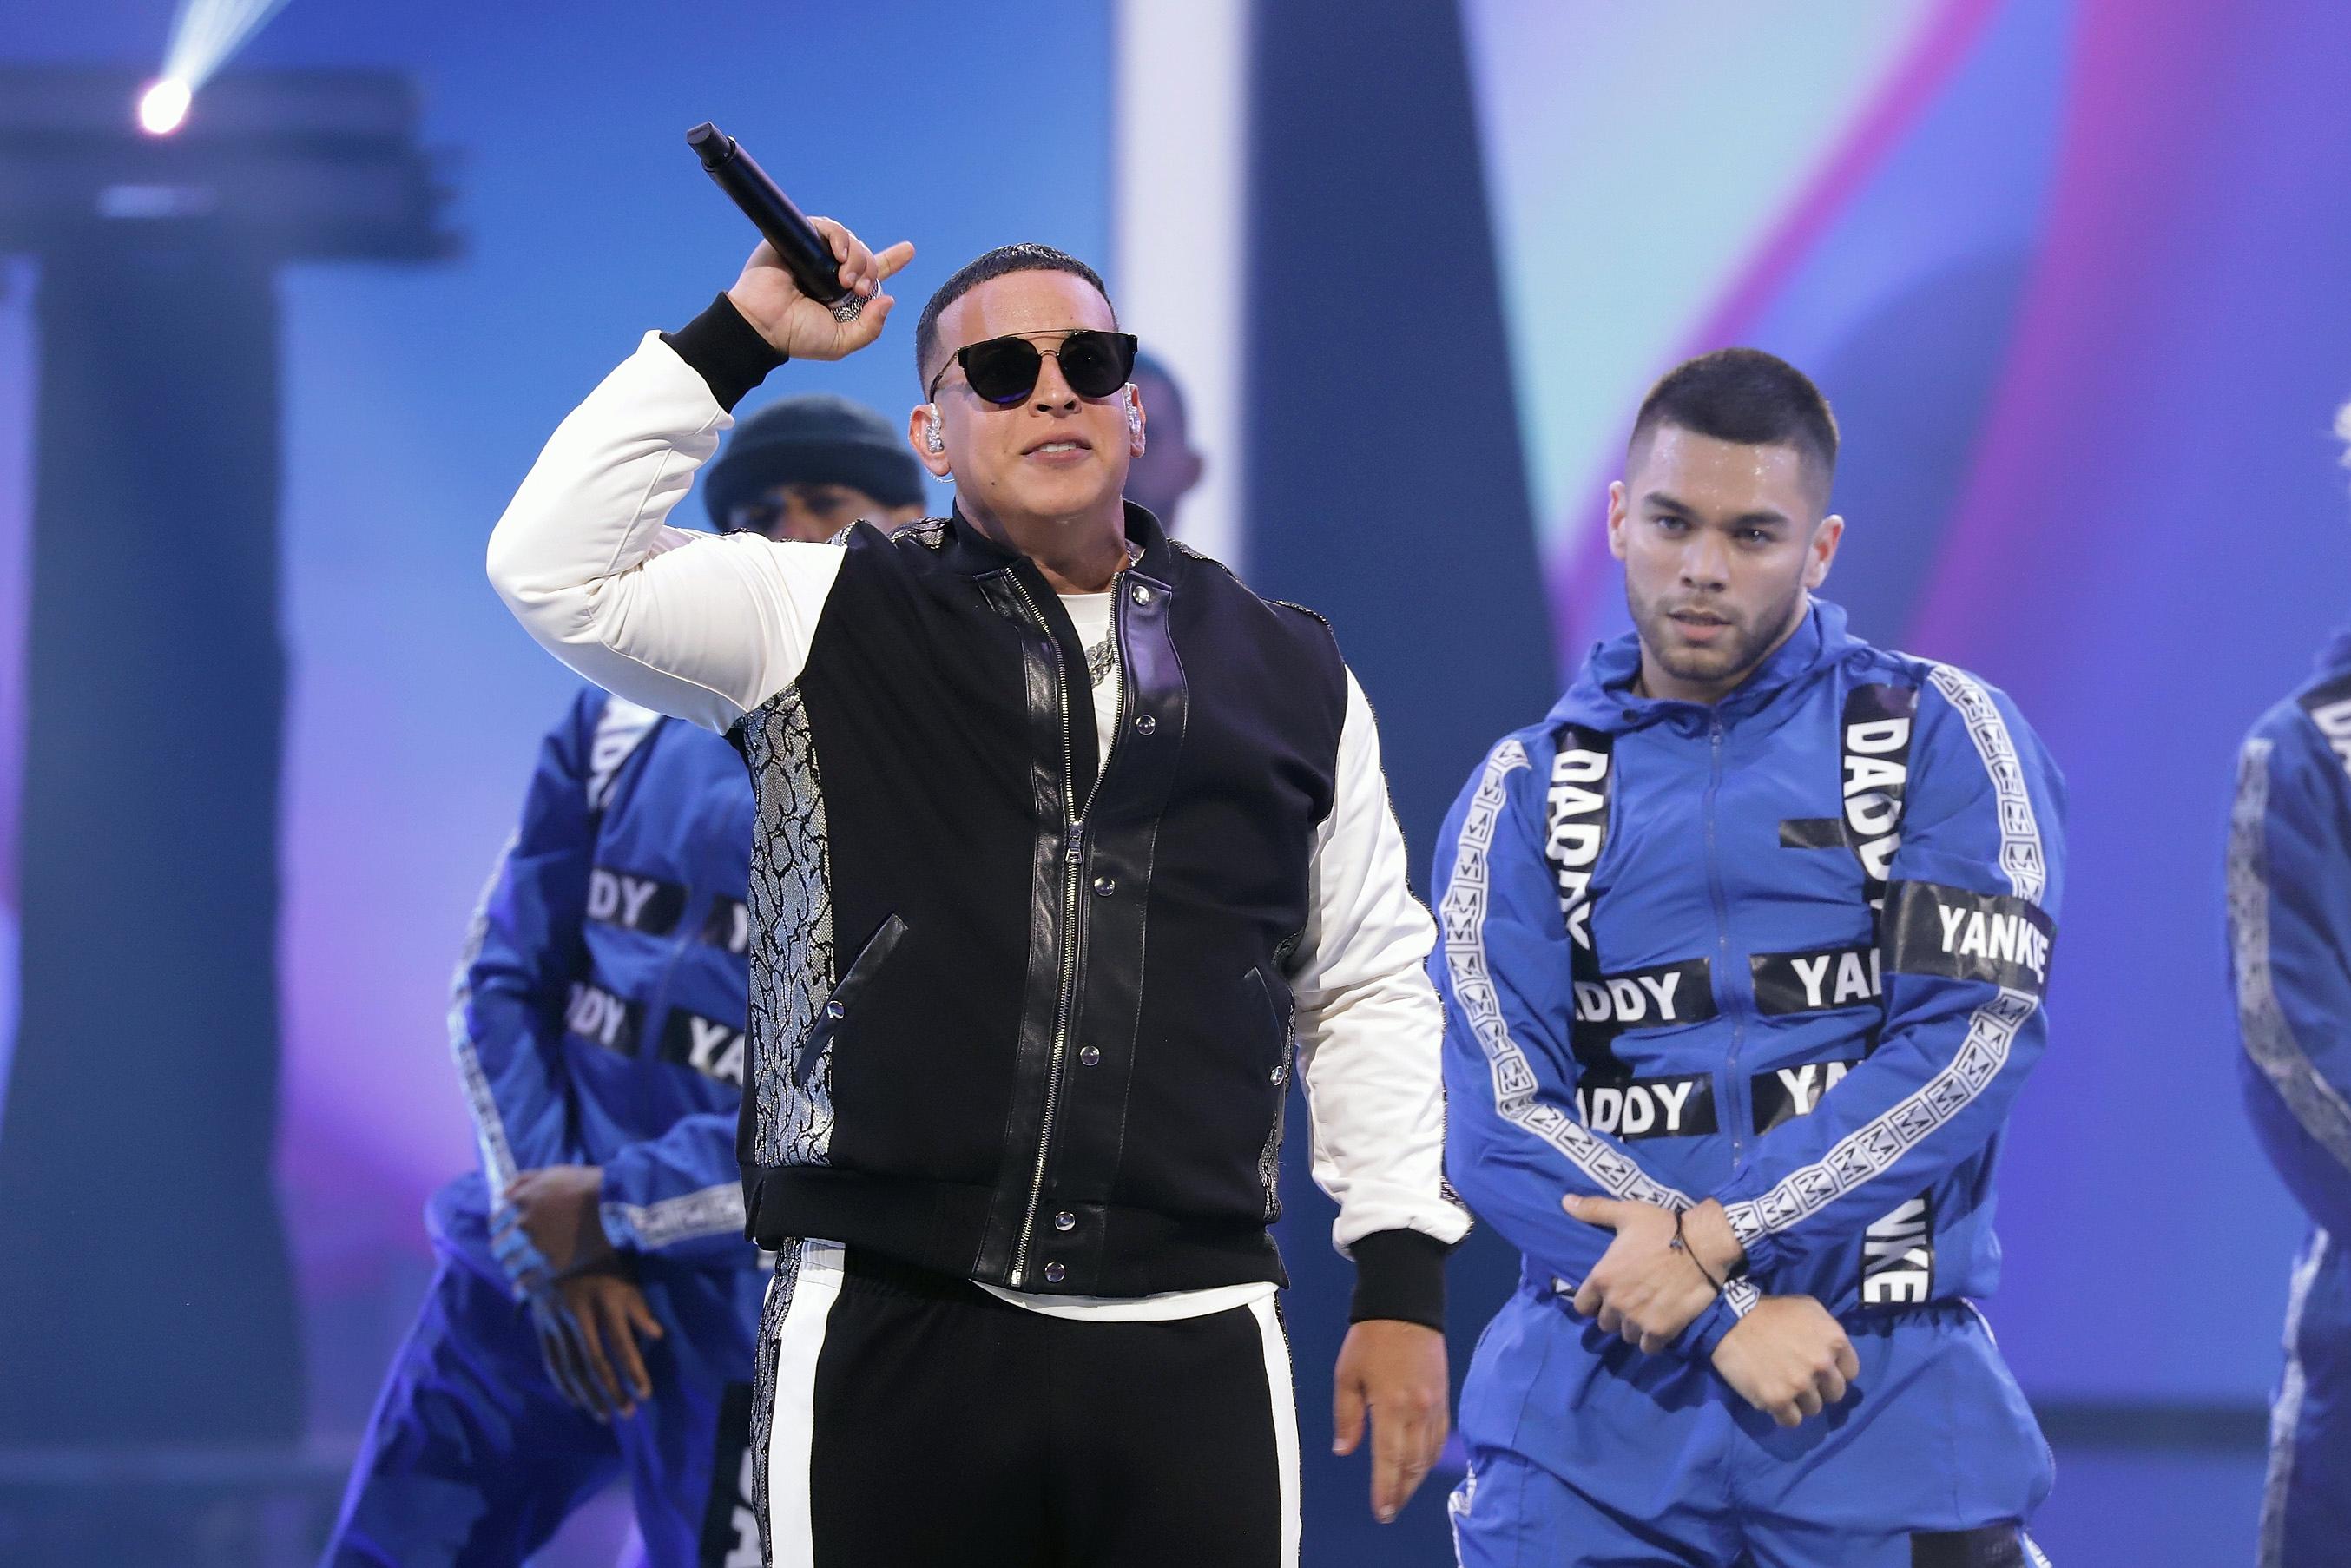 Premio Lo Nuestro 2019: Watch Daddy Yankee's Career-Spanning Medley - Rolling Stone